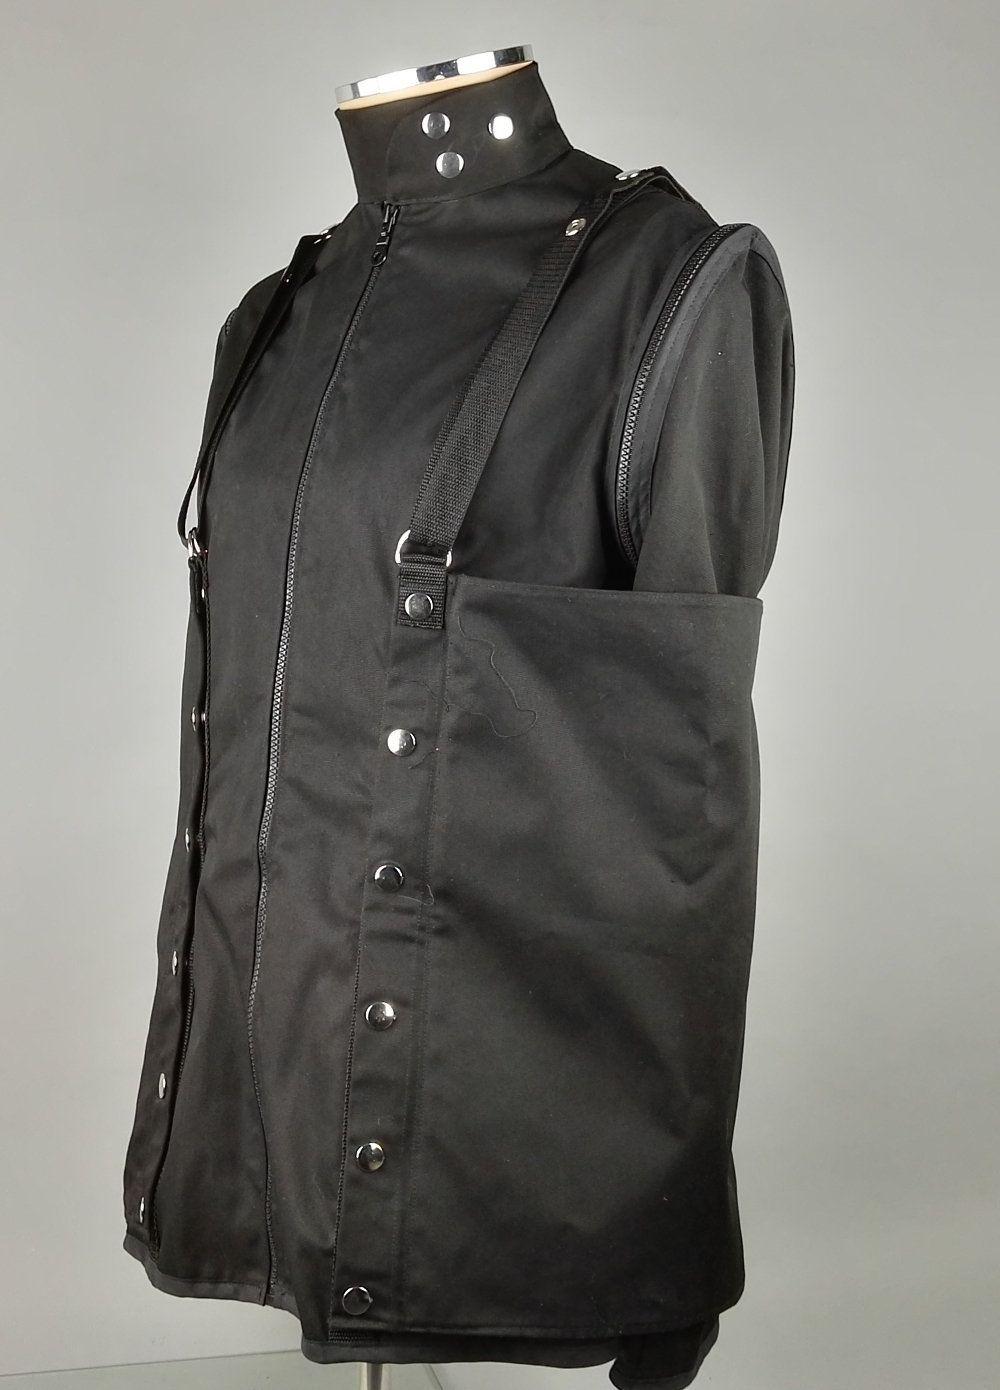 Male Armbinder Bondage Straitjacket, Mens Alt Fashion, Bdsm Restraint  Straight Jacket